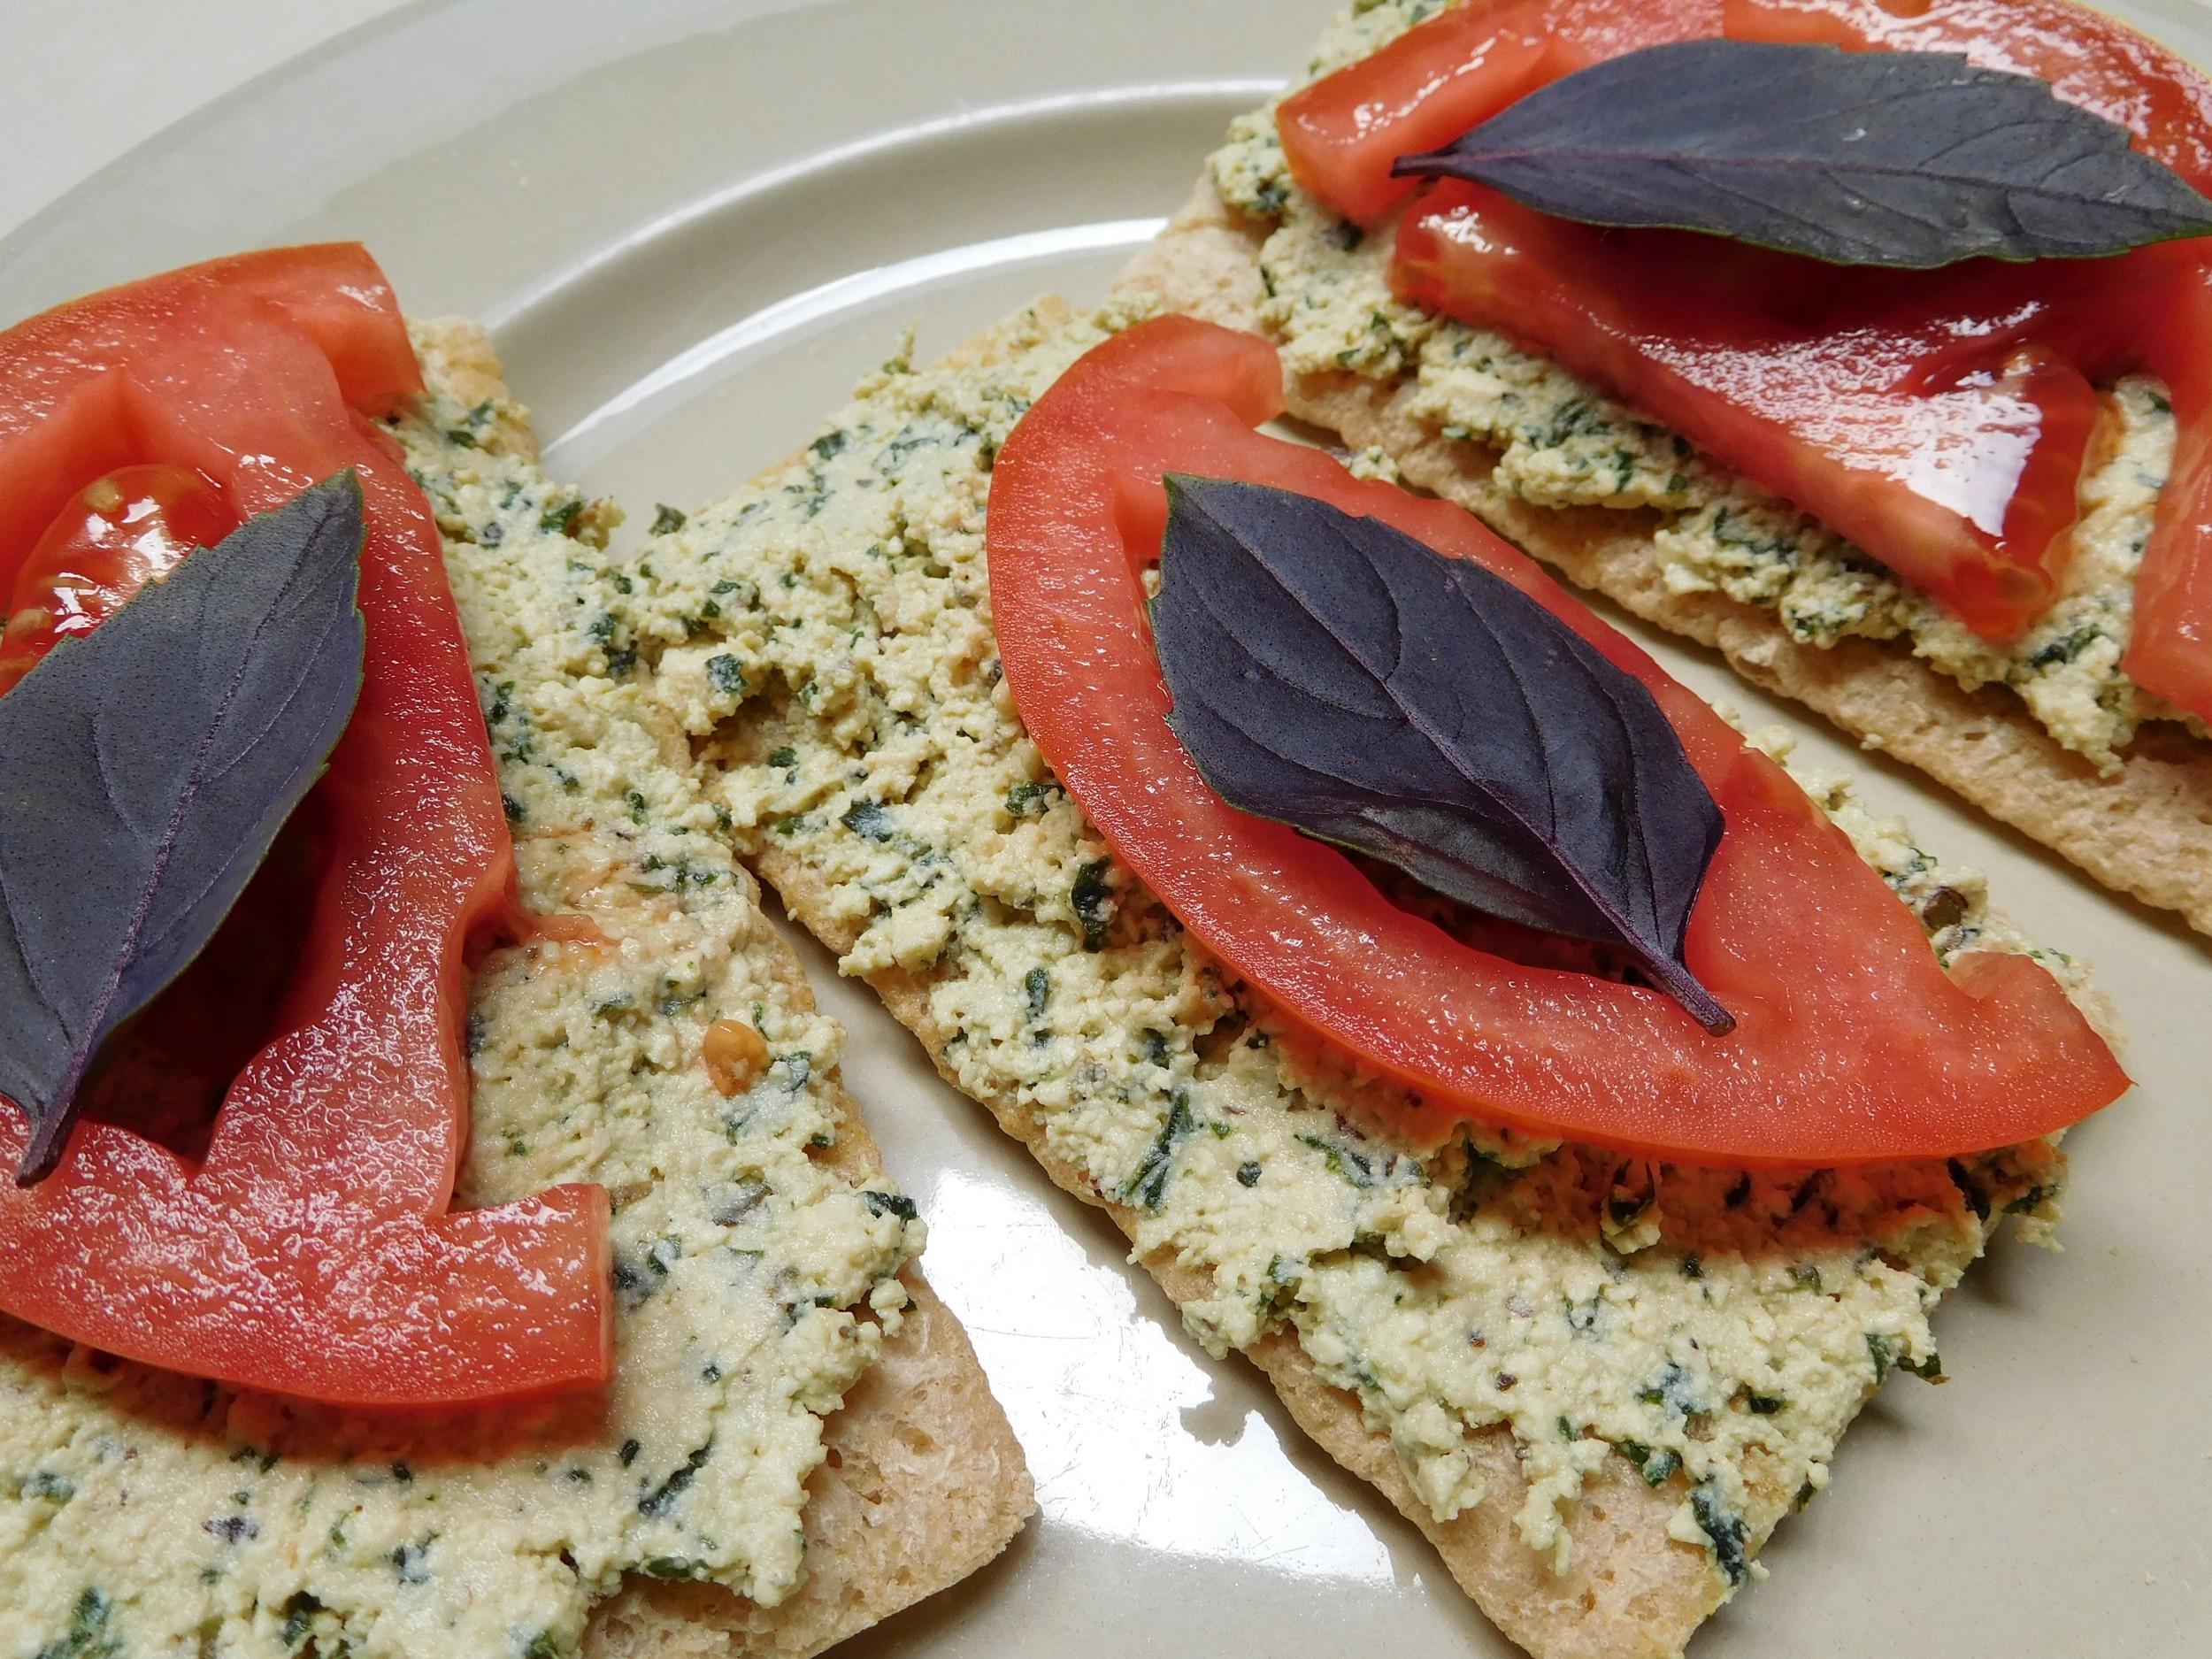 tofu ricotta on crackers.JPG